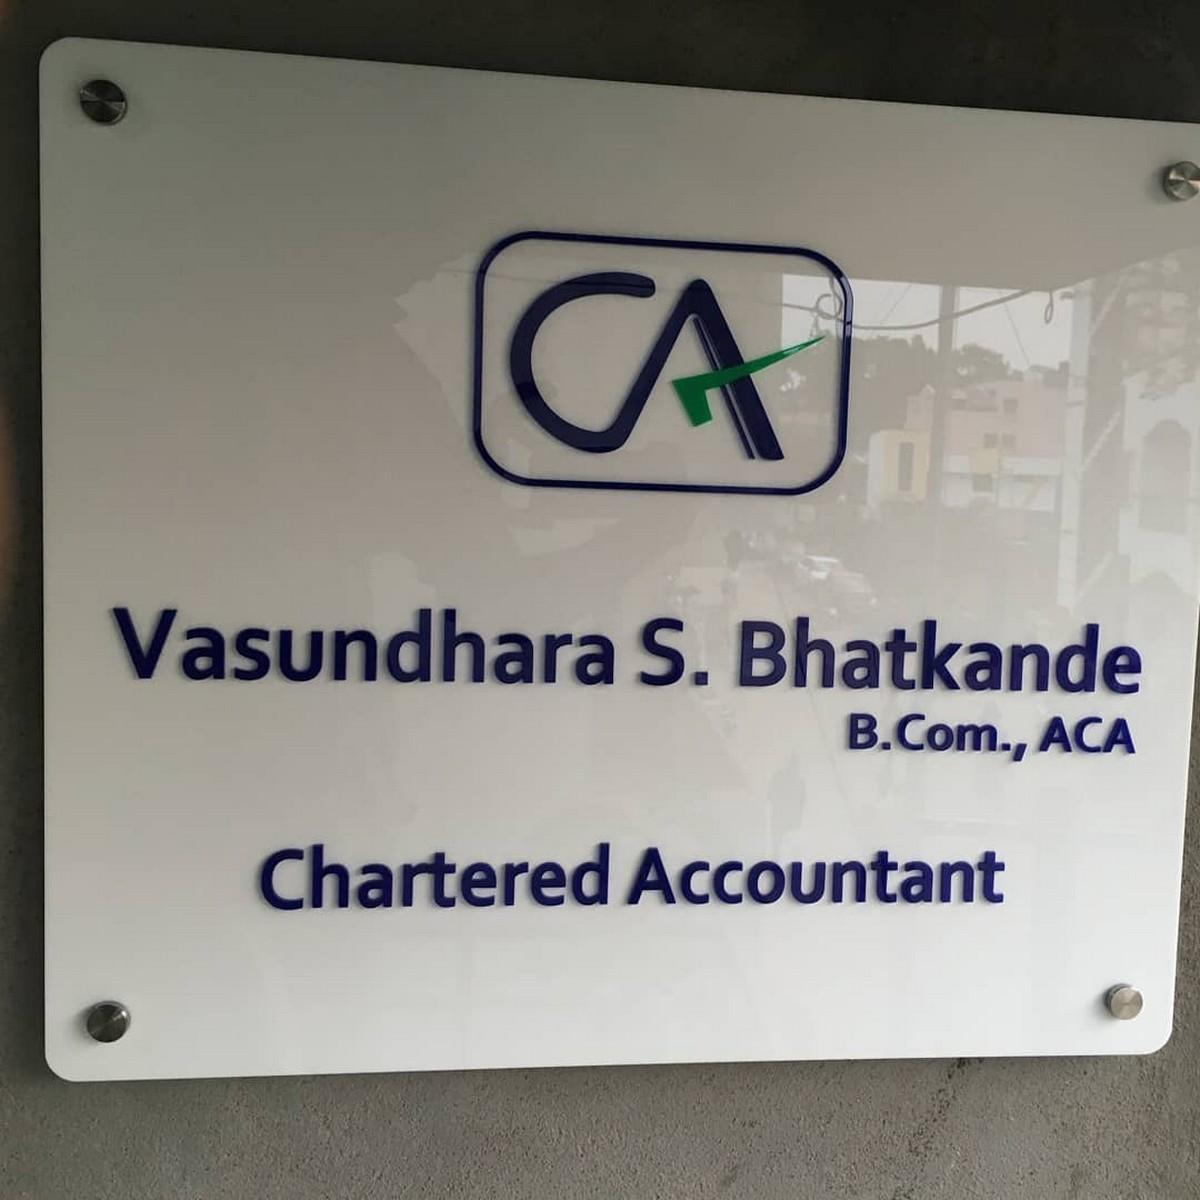 Chartered Accountant Acrylic Name Plate  Chartered Accountant Name Plate